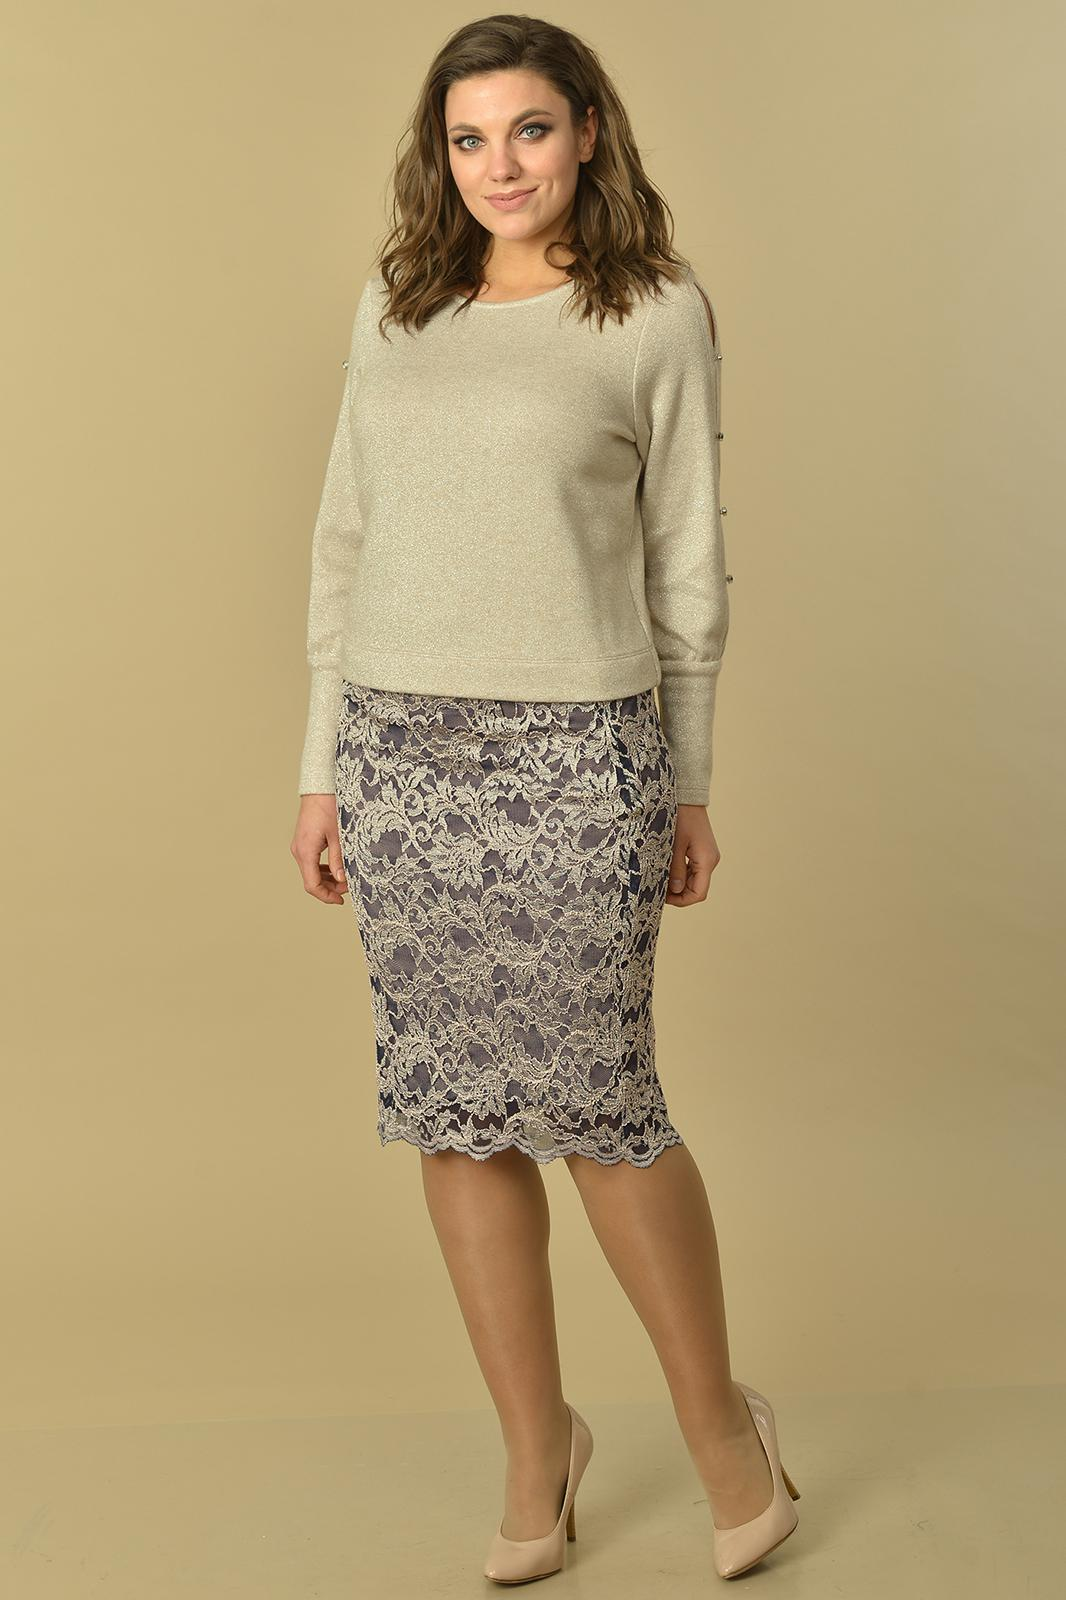 Одежда Lady Style Интернет Магазин